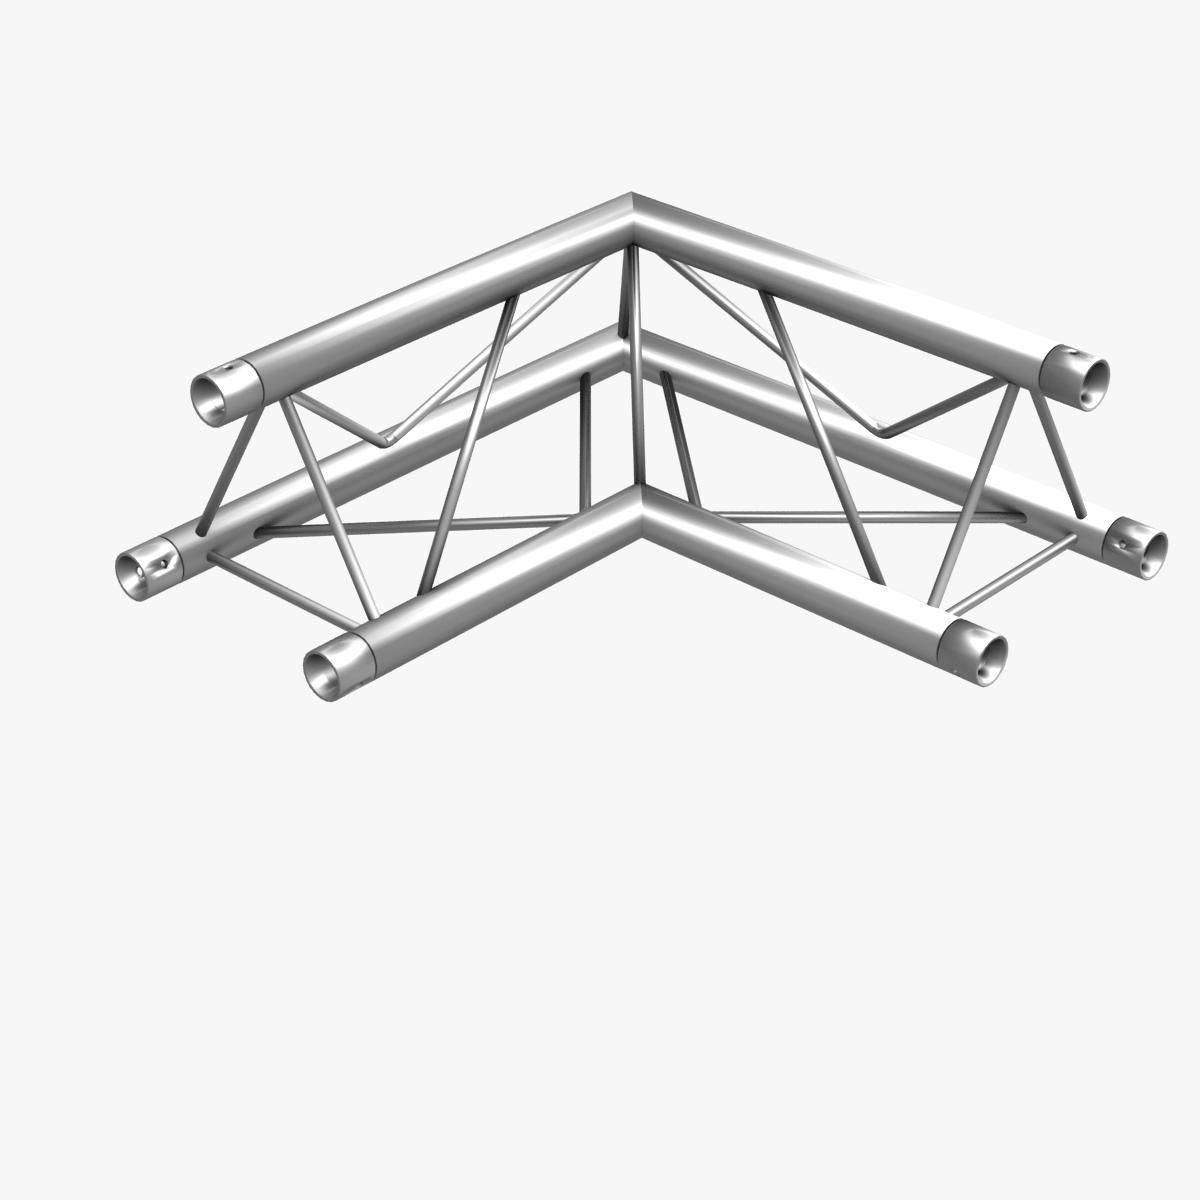 triangular trusses (collection 55 modular pieces) 3d model 3ds max dxf fbx c4d dae texture obj 216257